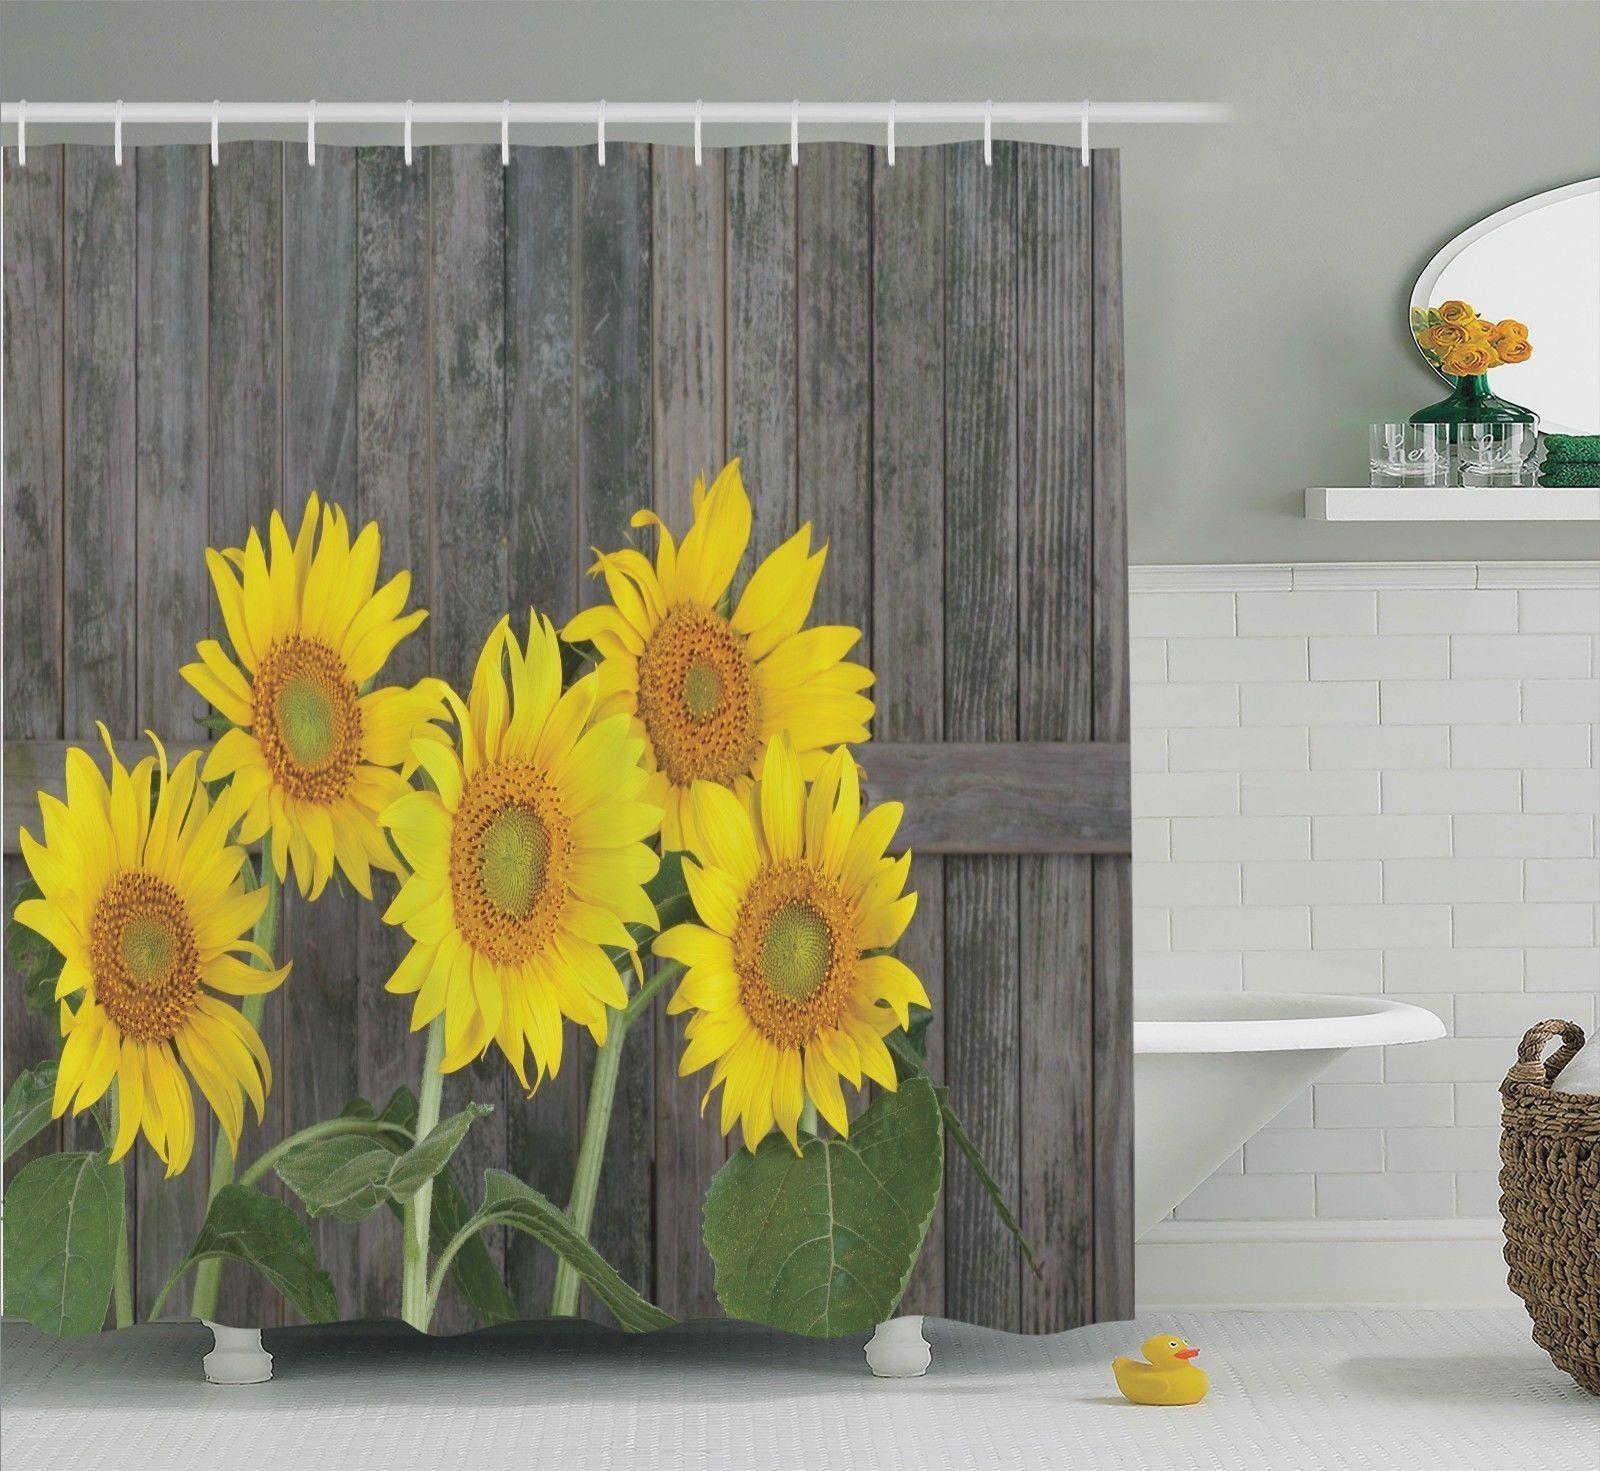 Home Sunflower Decor Shower Curtain Sets Luxury Towels